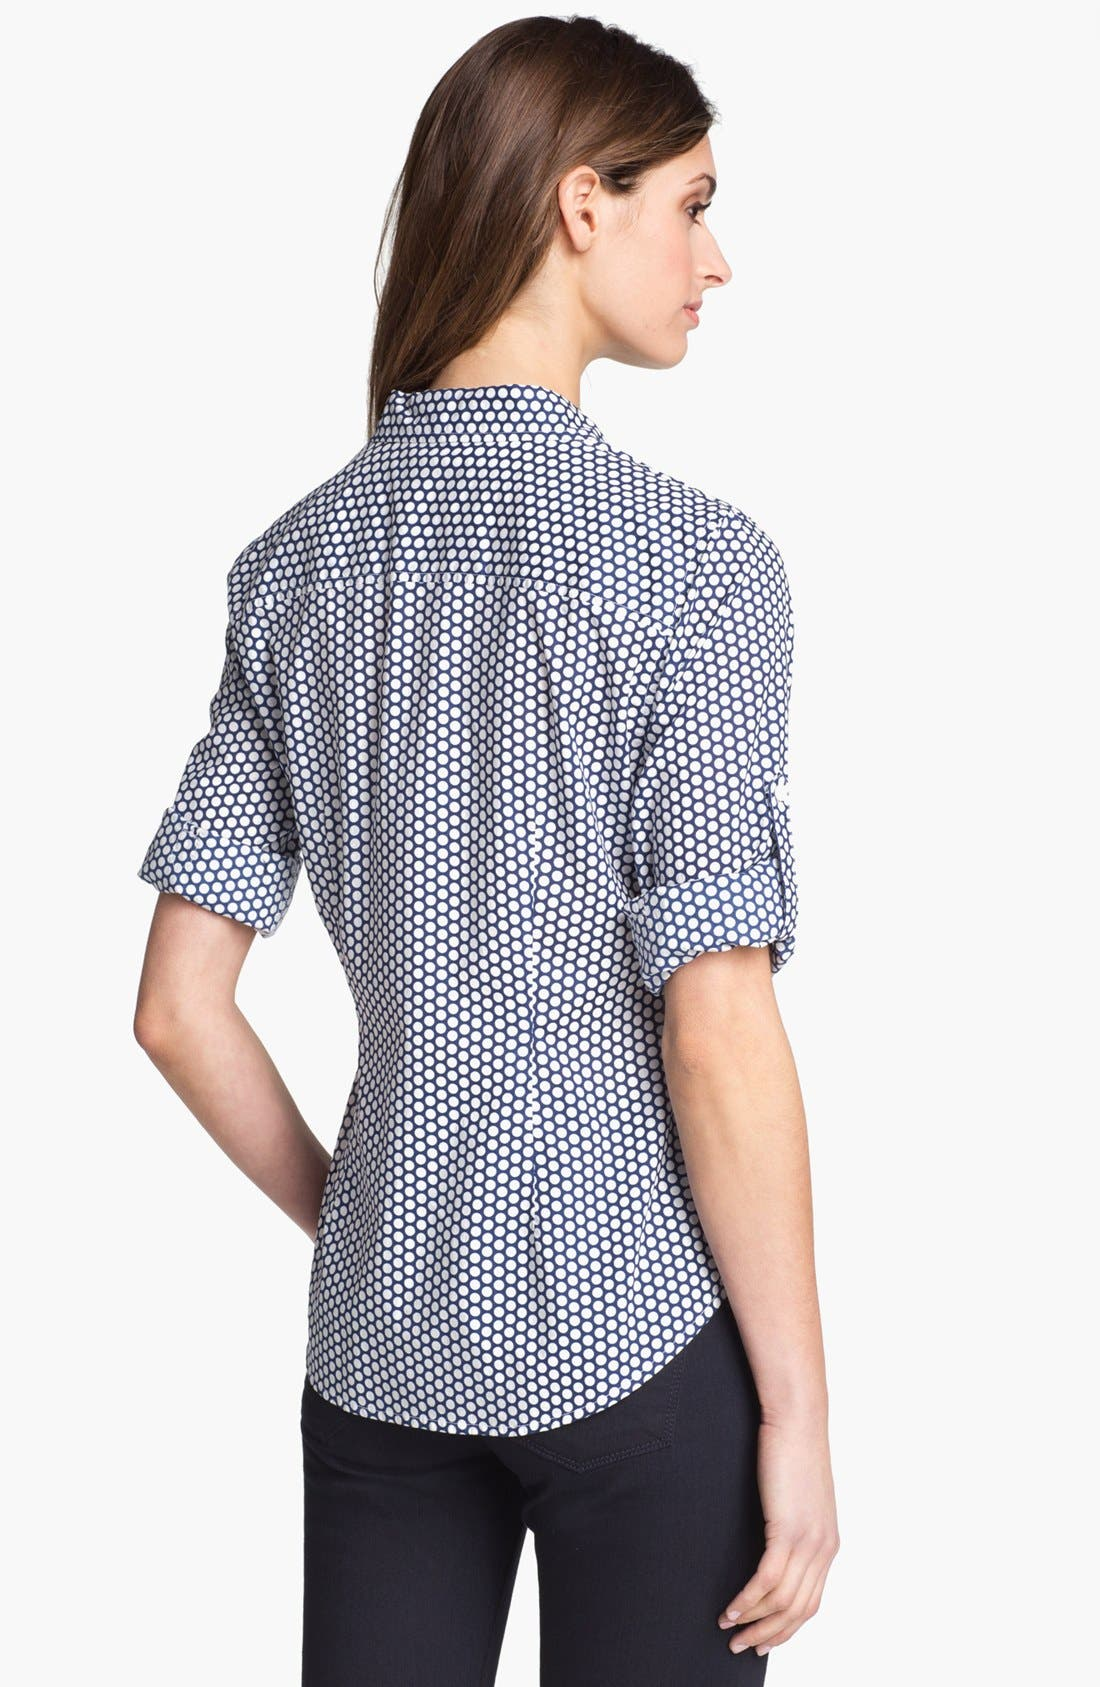 Alternate Image 2  - Sandra Ingrish Roll Sleeve Polka Dot Shirt (Petite)